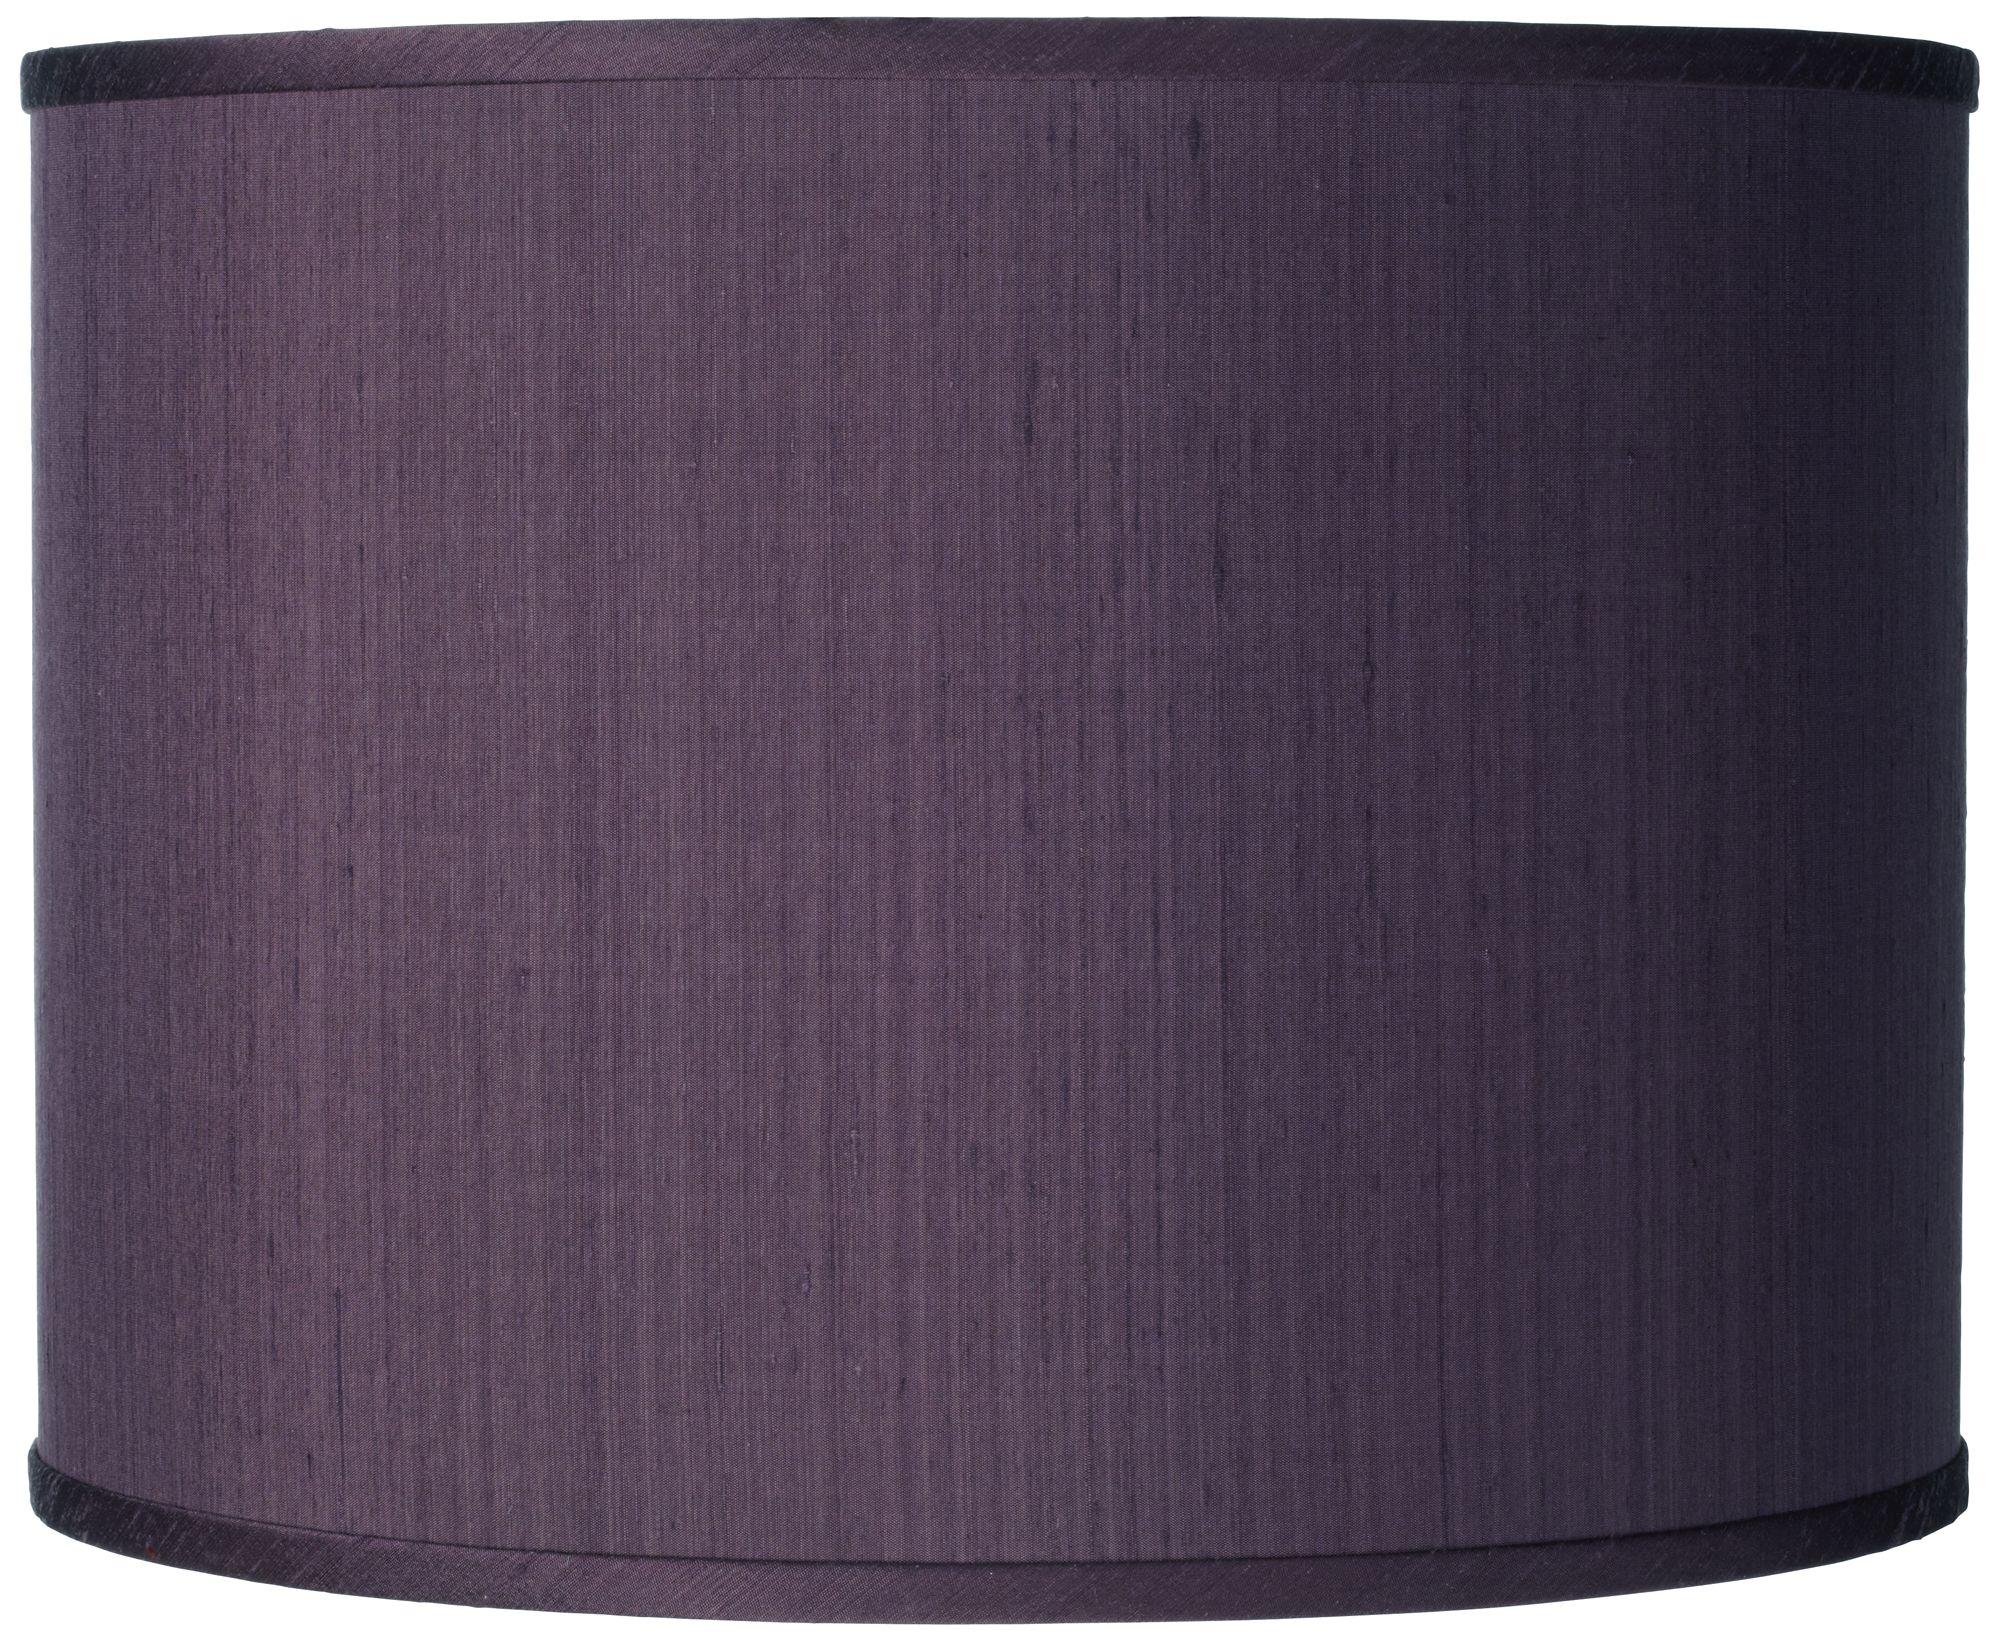 Eggplant Faux Silk Drum Shade 13.5X13.5X10 (Spider)